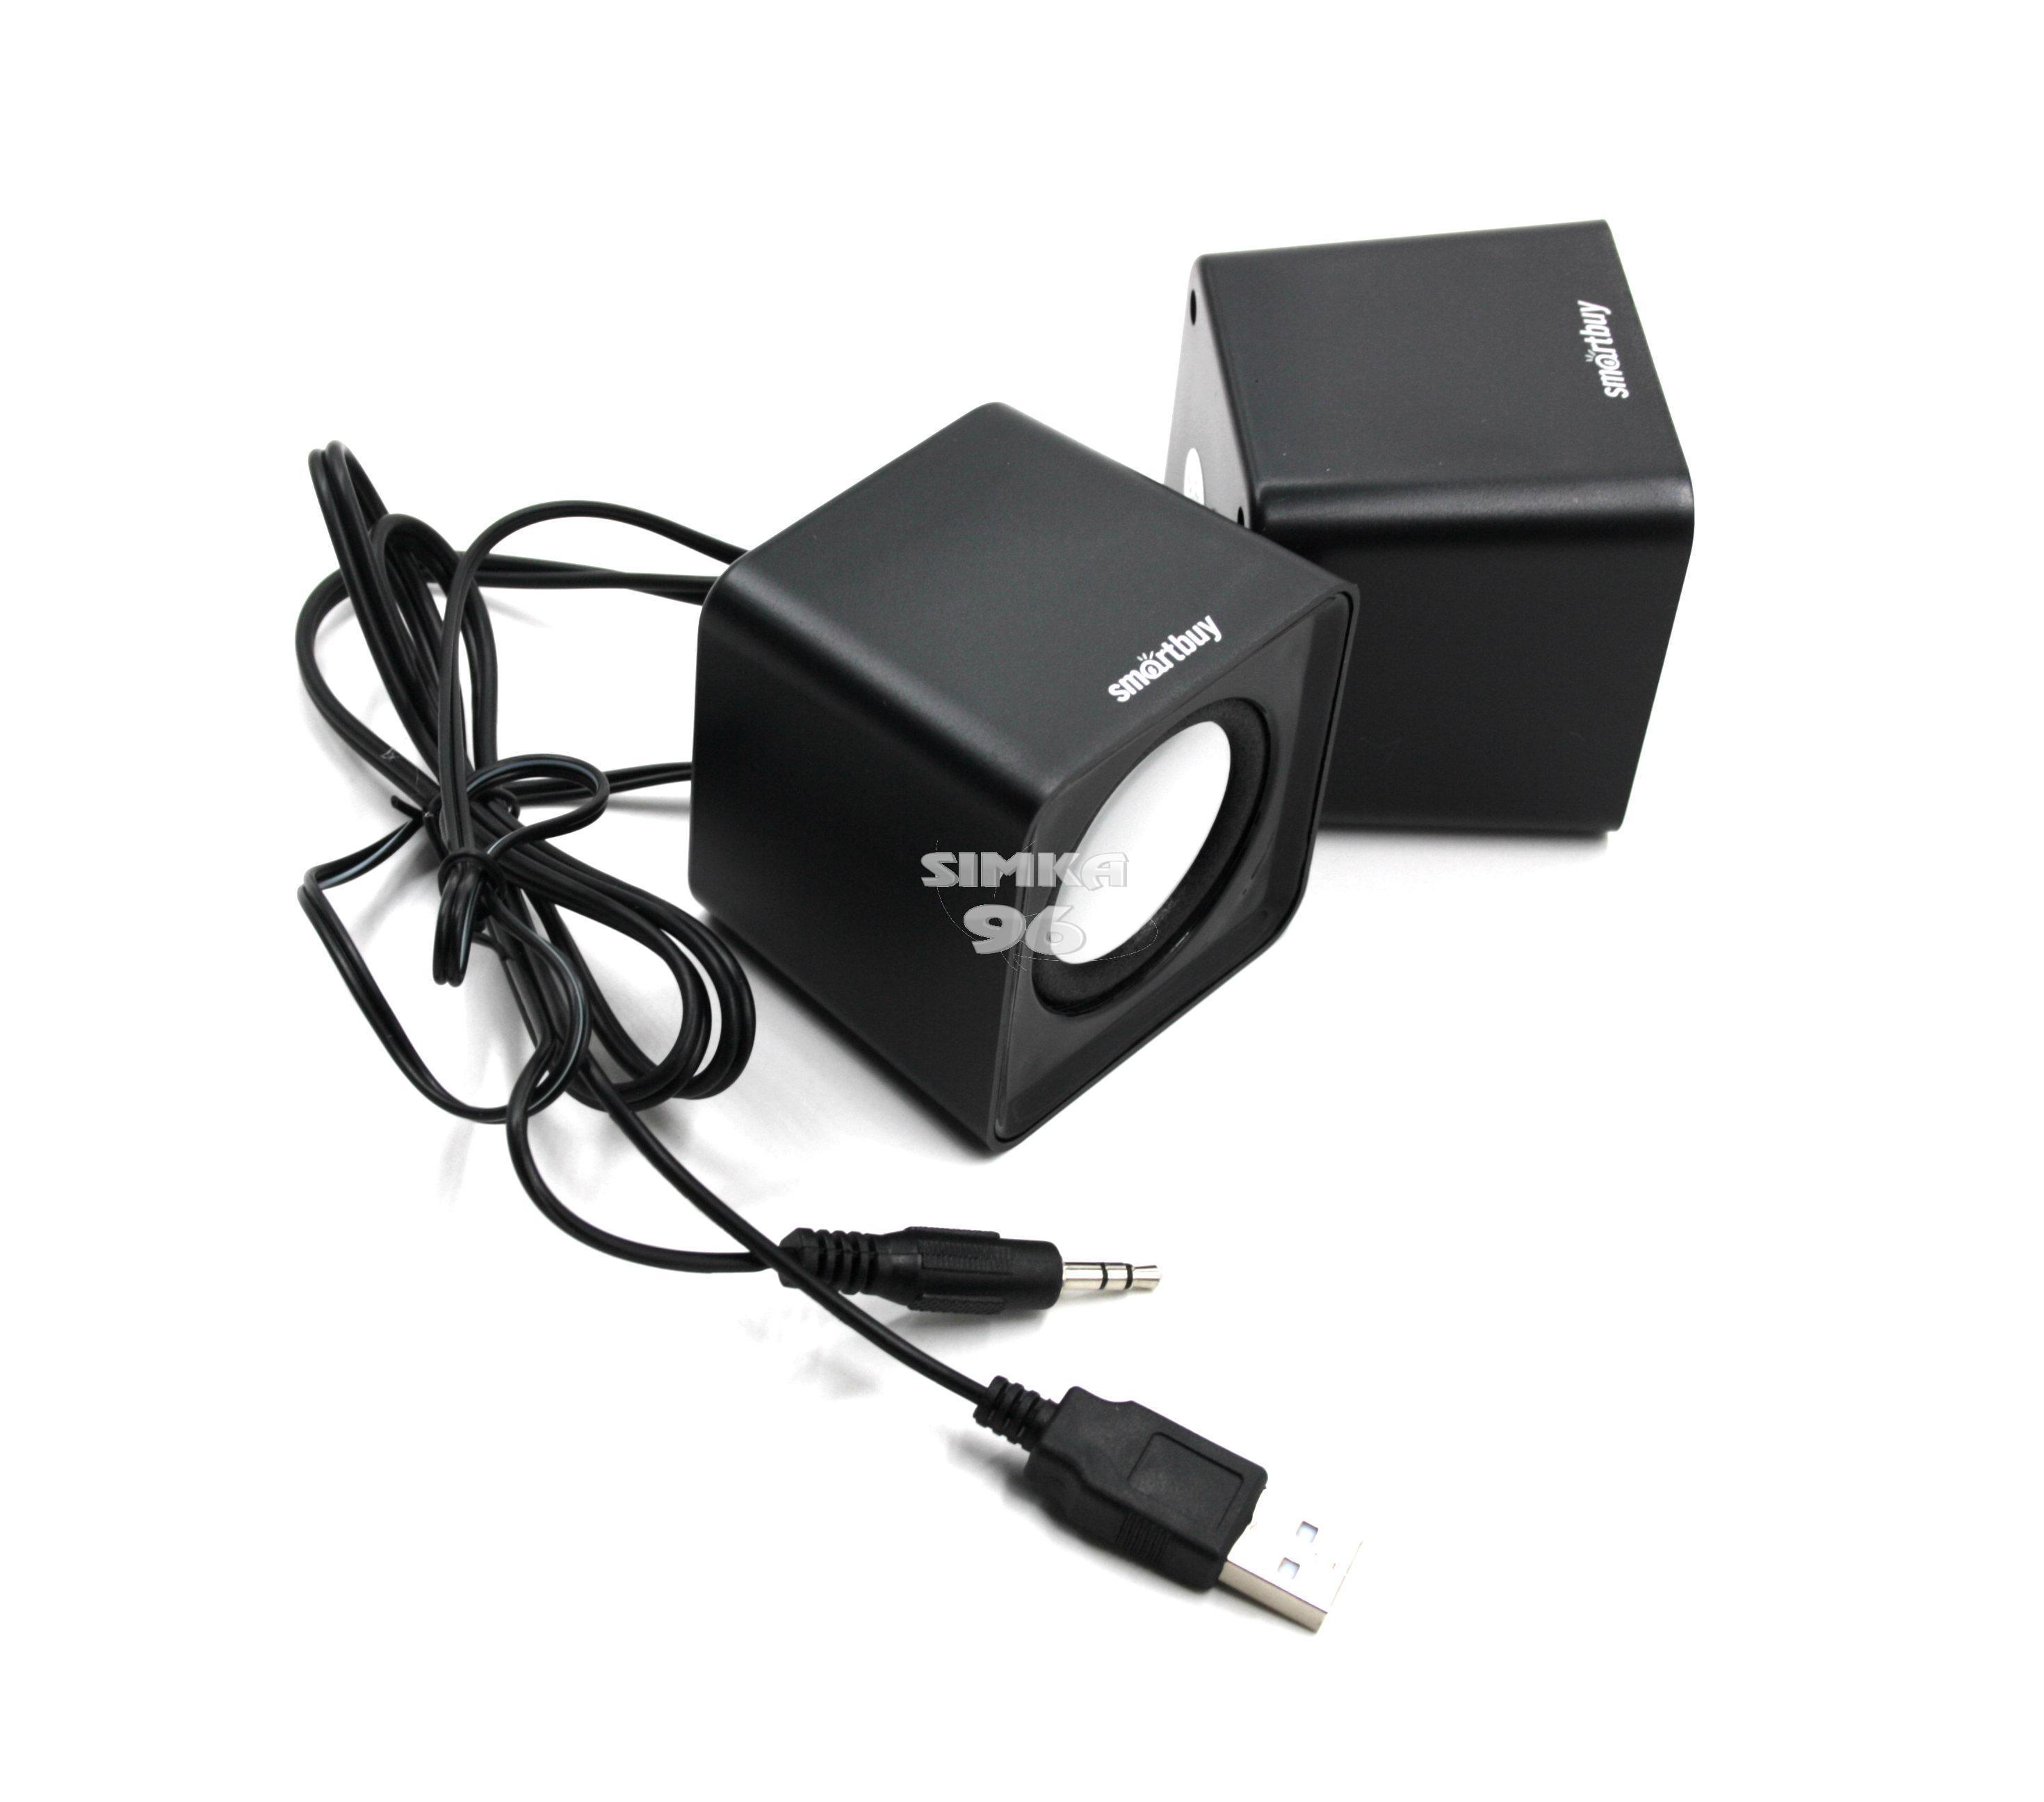 Акустическая система 2.0 Smartbuy SBA-2800 MINI 4Вт, питание от USB